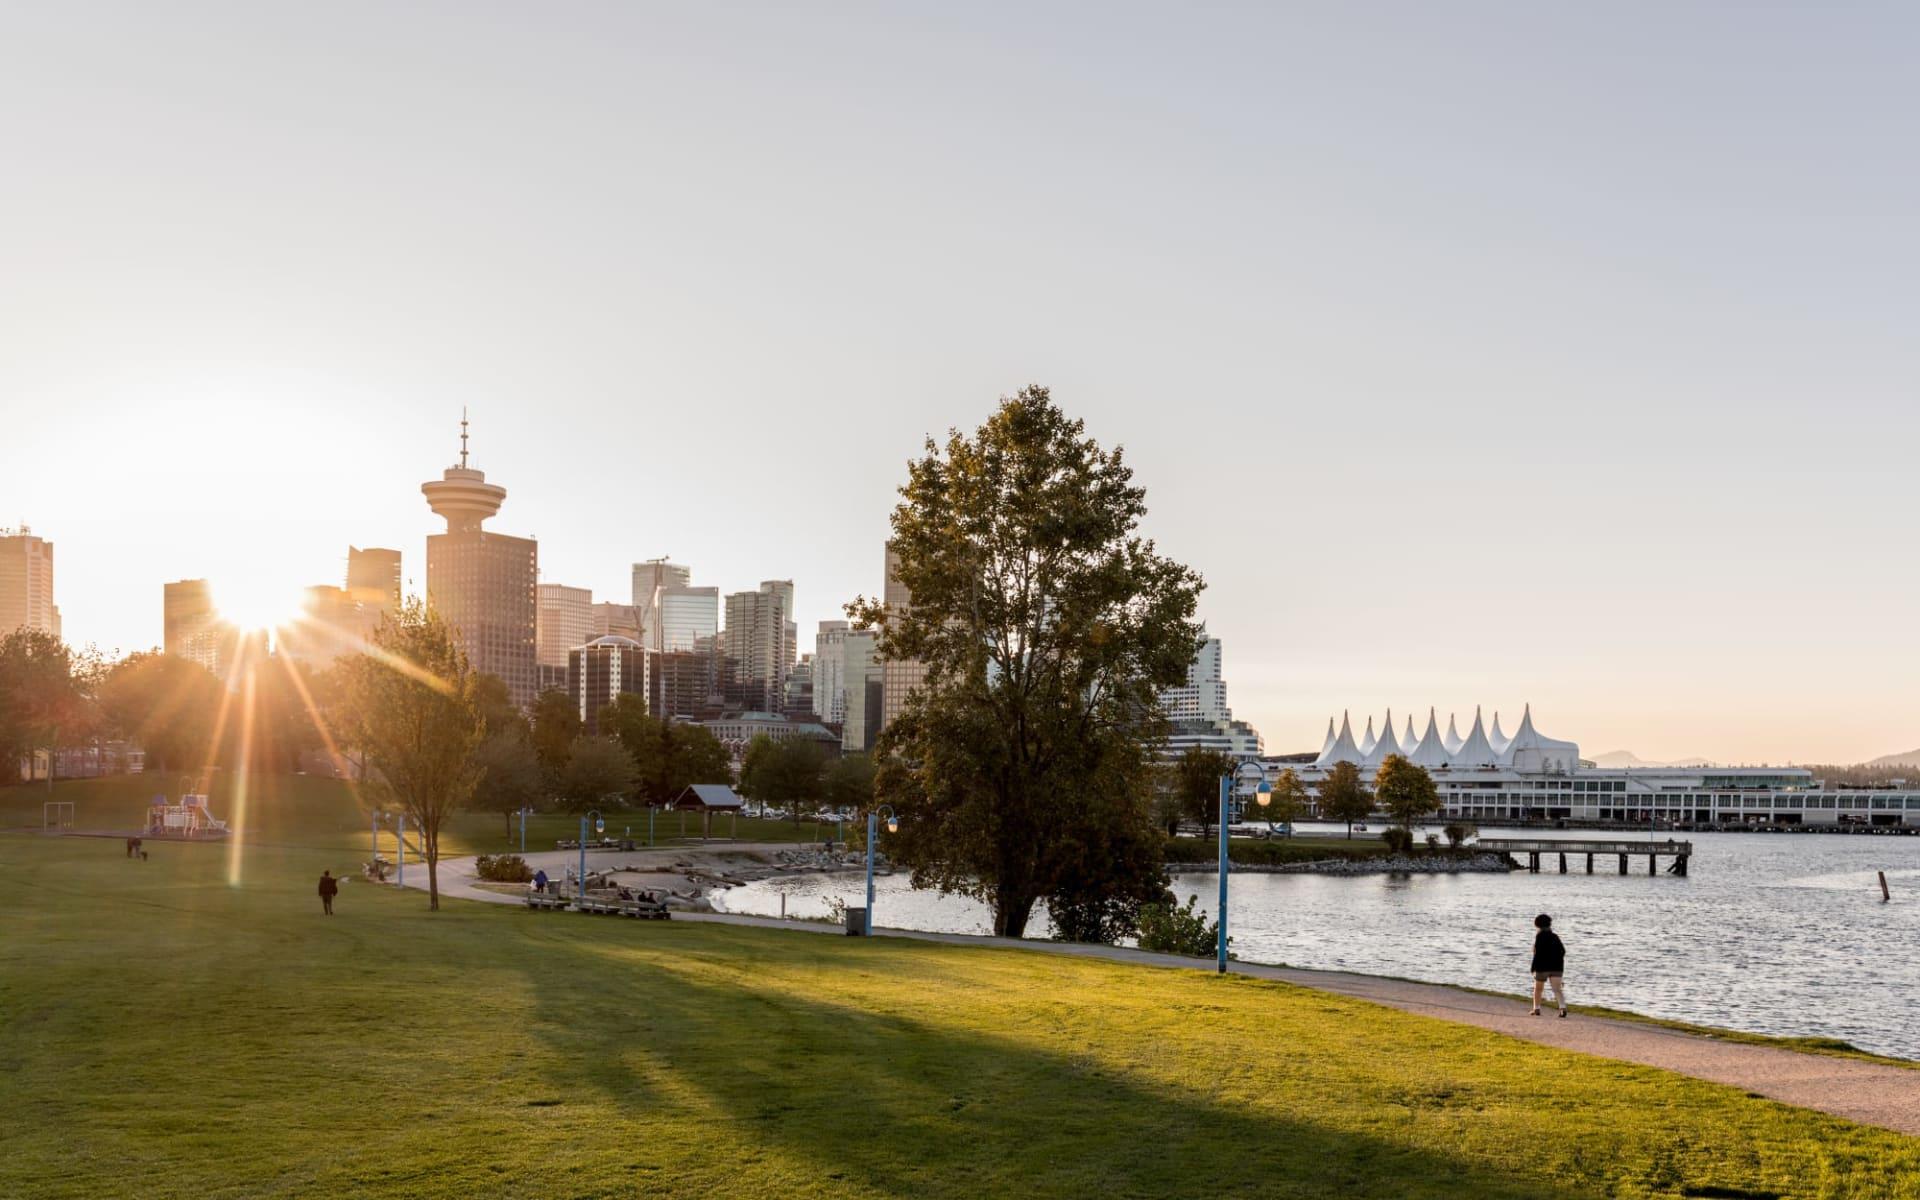 Lodge-Abenteuer Westkanada ab Calgary: Canada - British Columbia - Vancouver - Railtown CRAB Park